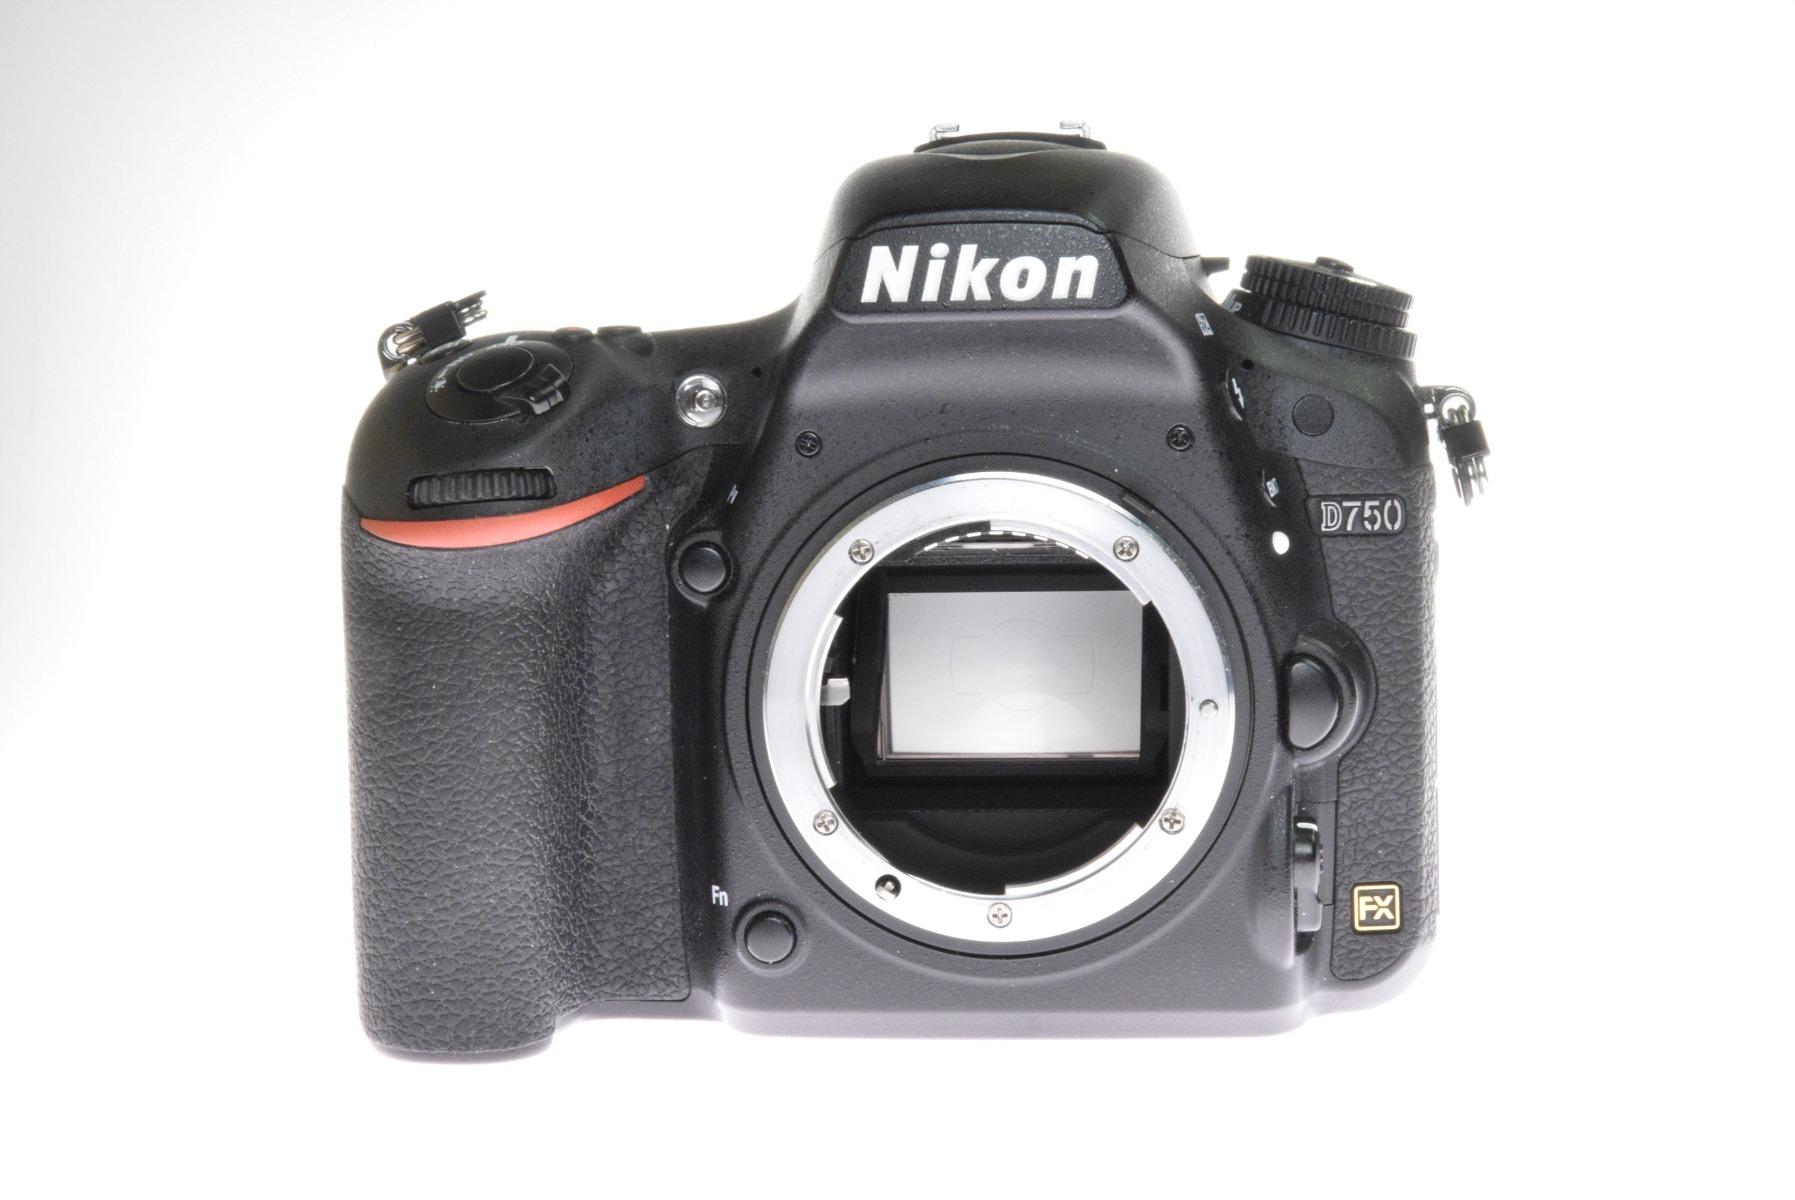 Used Nikon D750 DSLR Camera Body (64,000 shutter actuations)